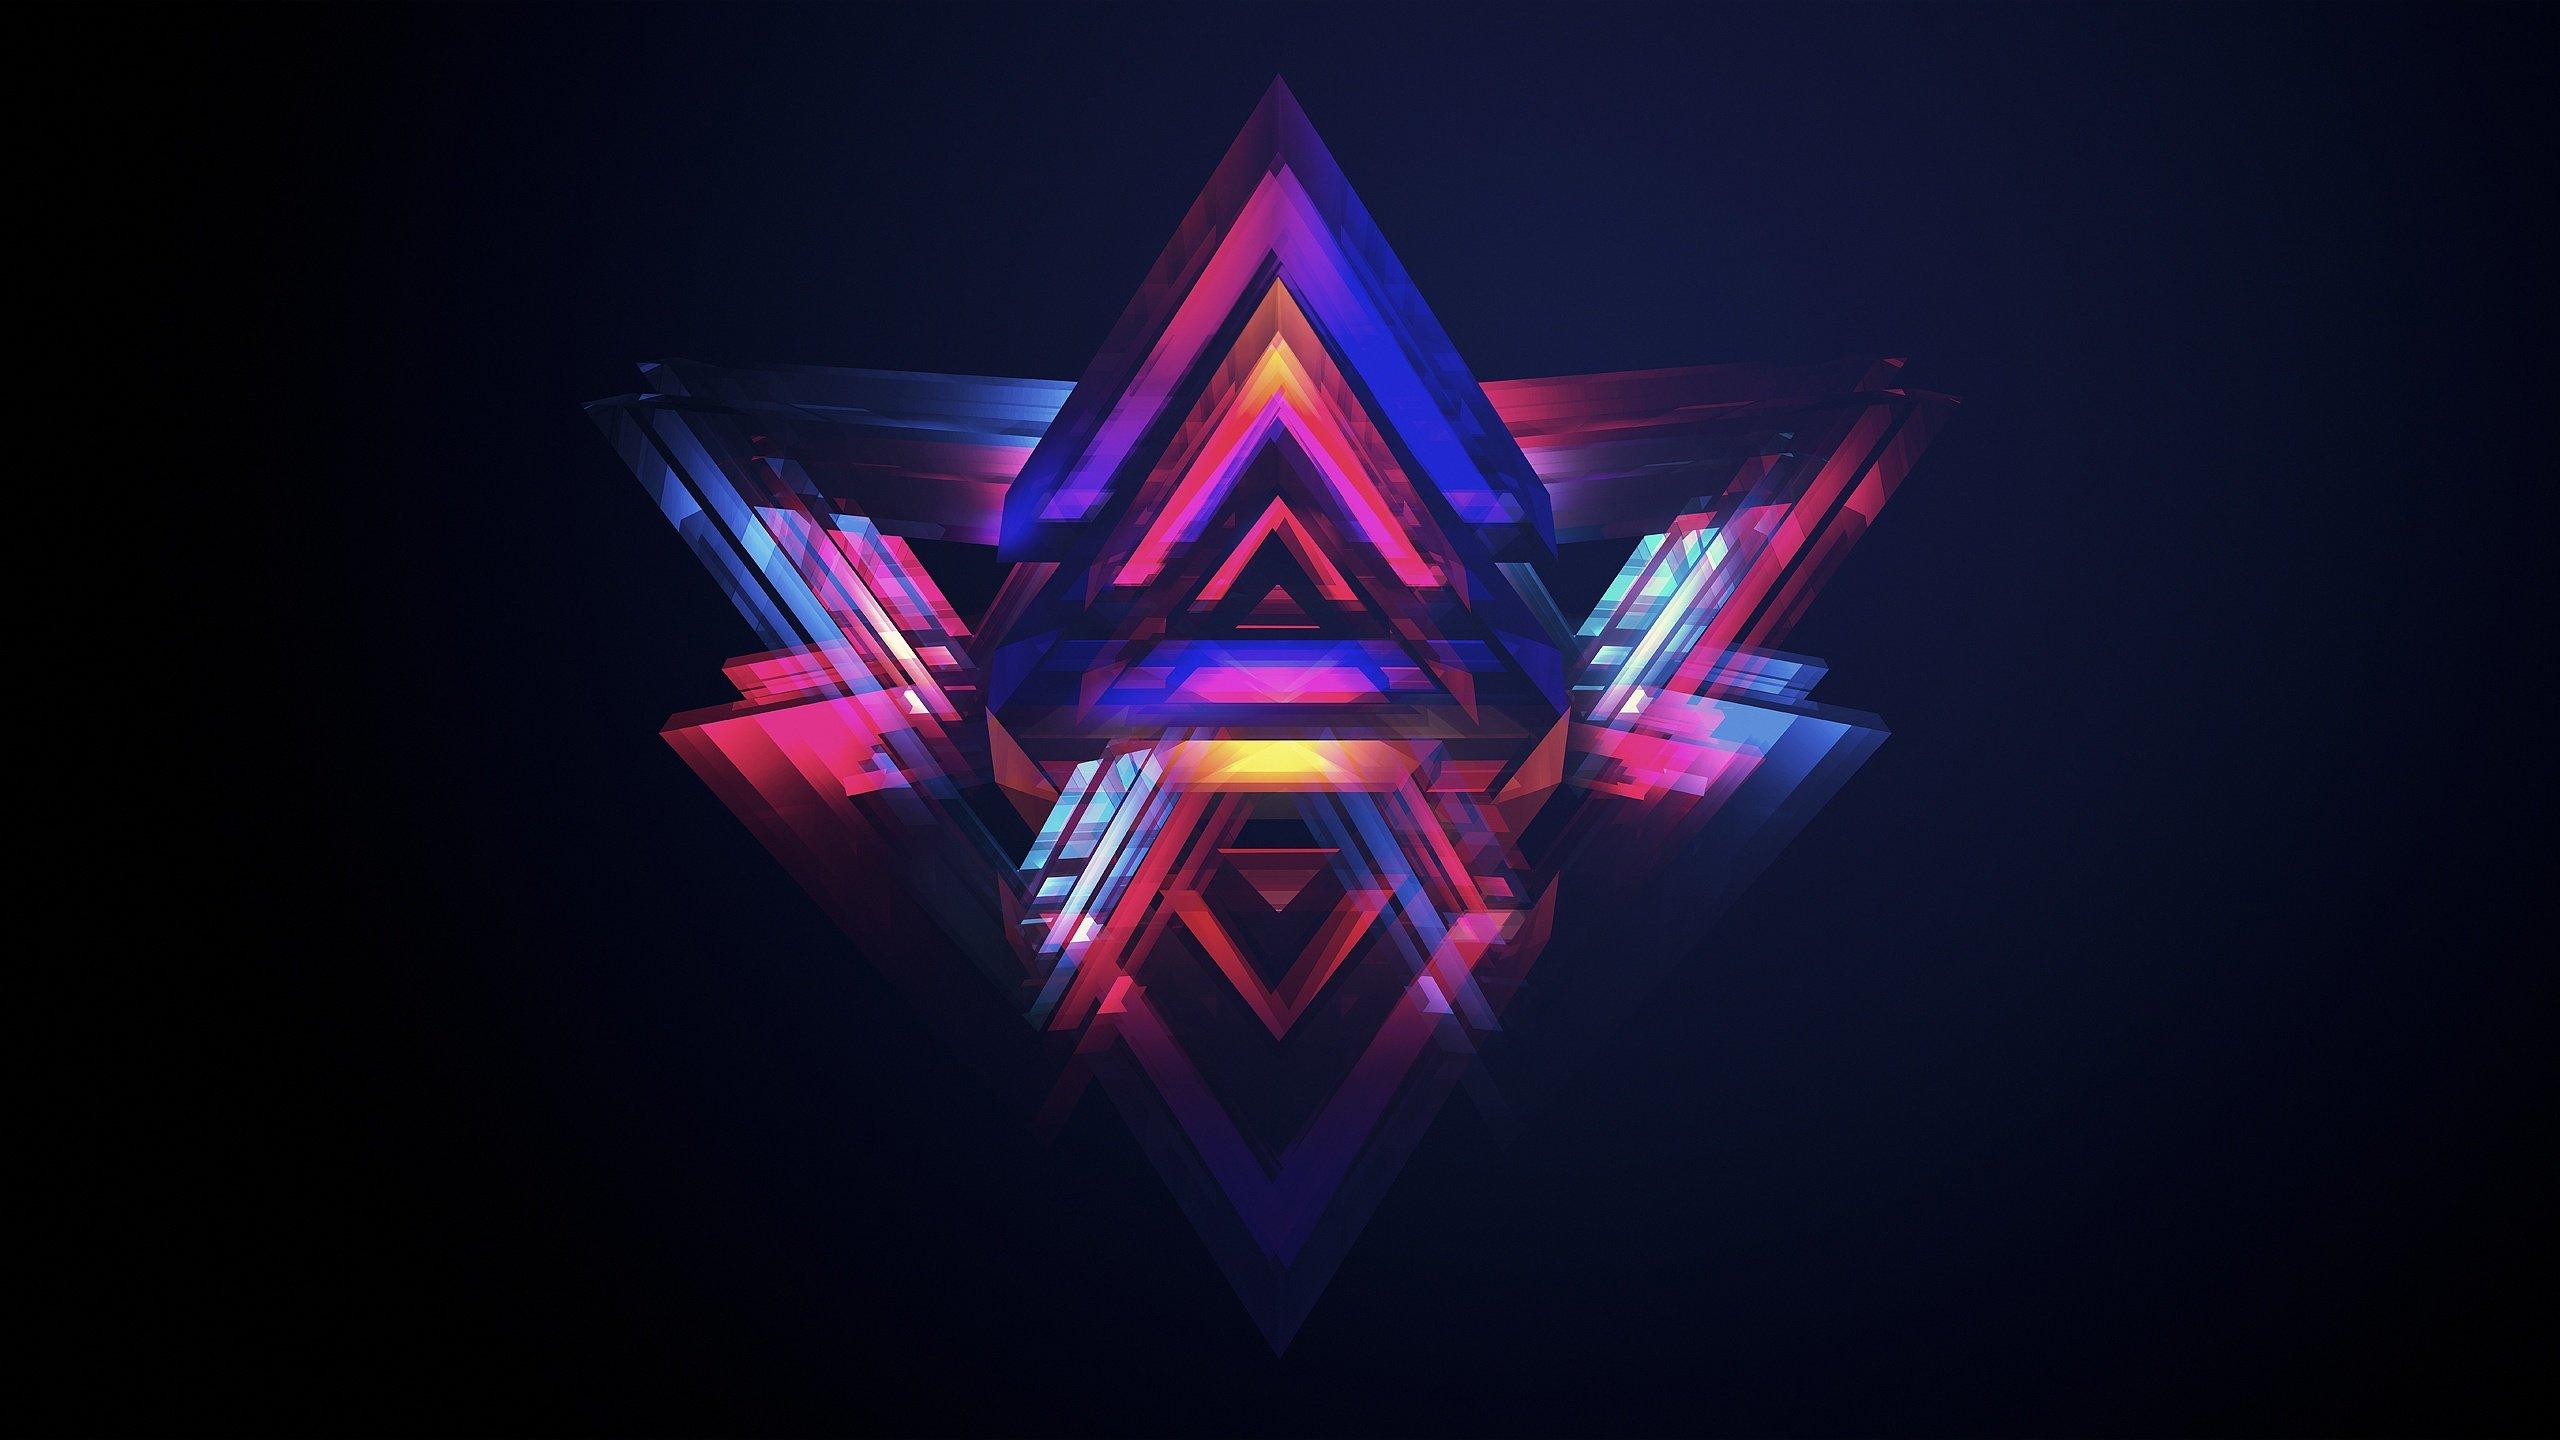 abstract_pyramids-2560x1440